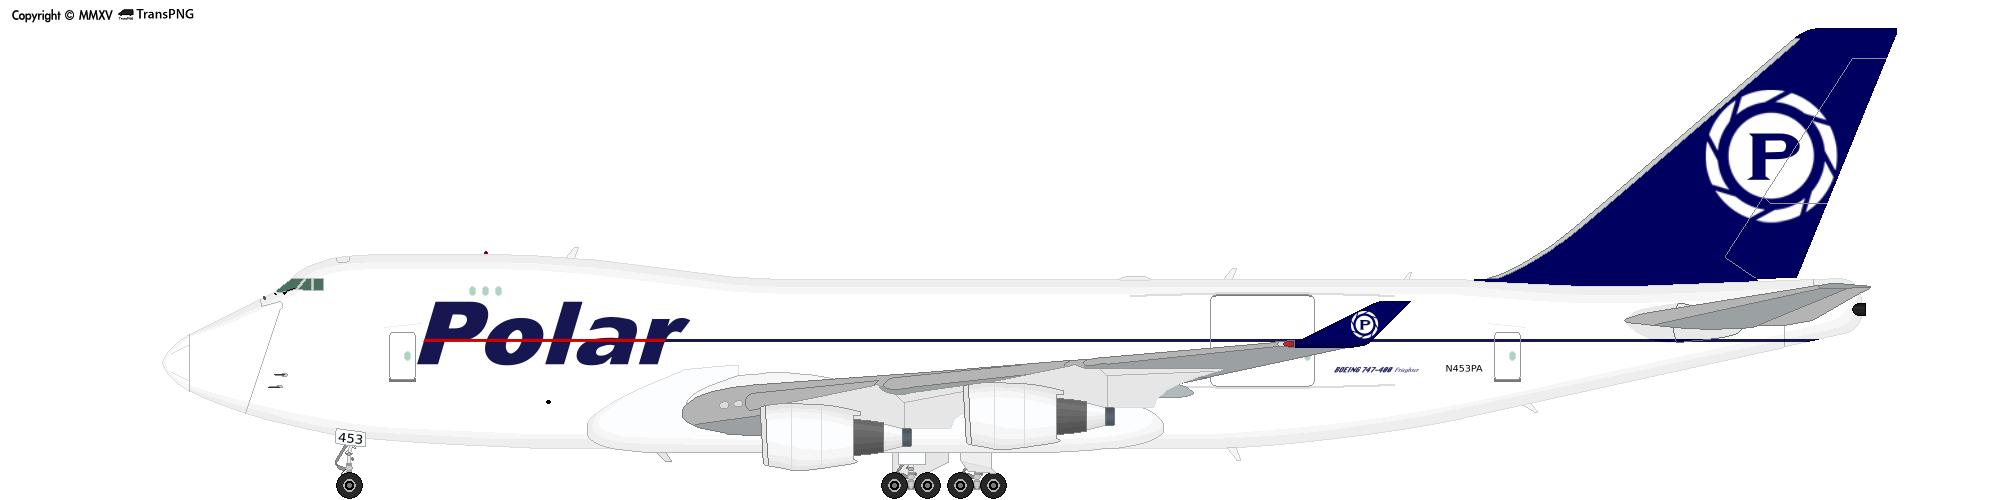 Airplane 6197